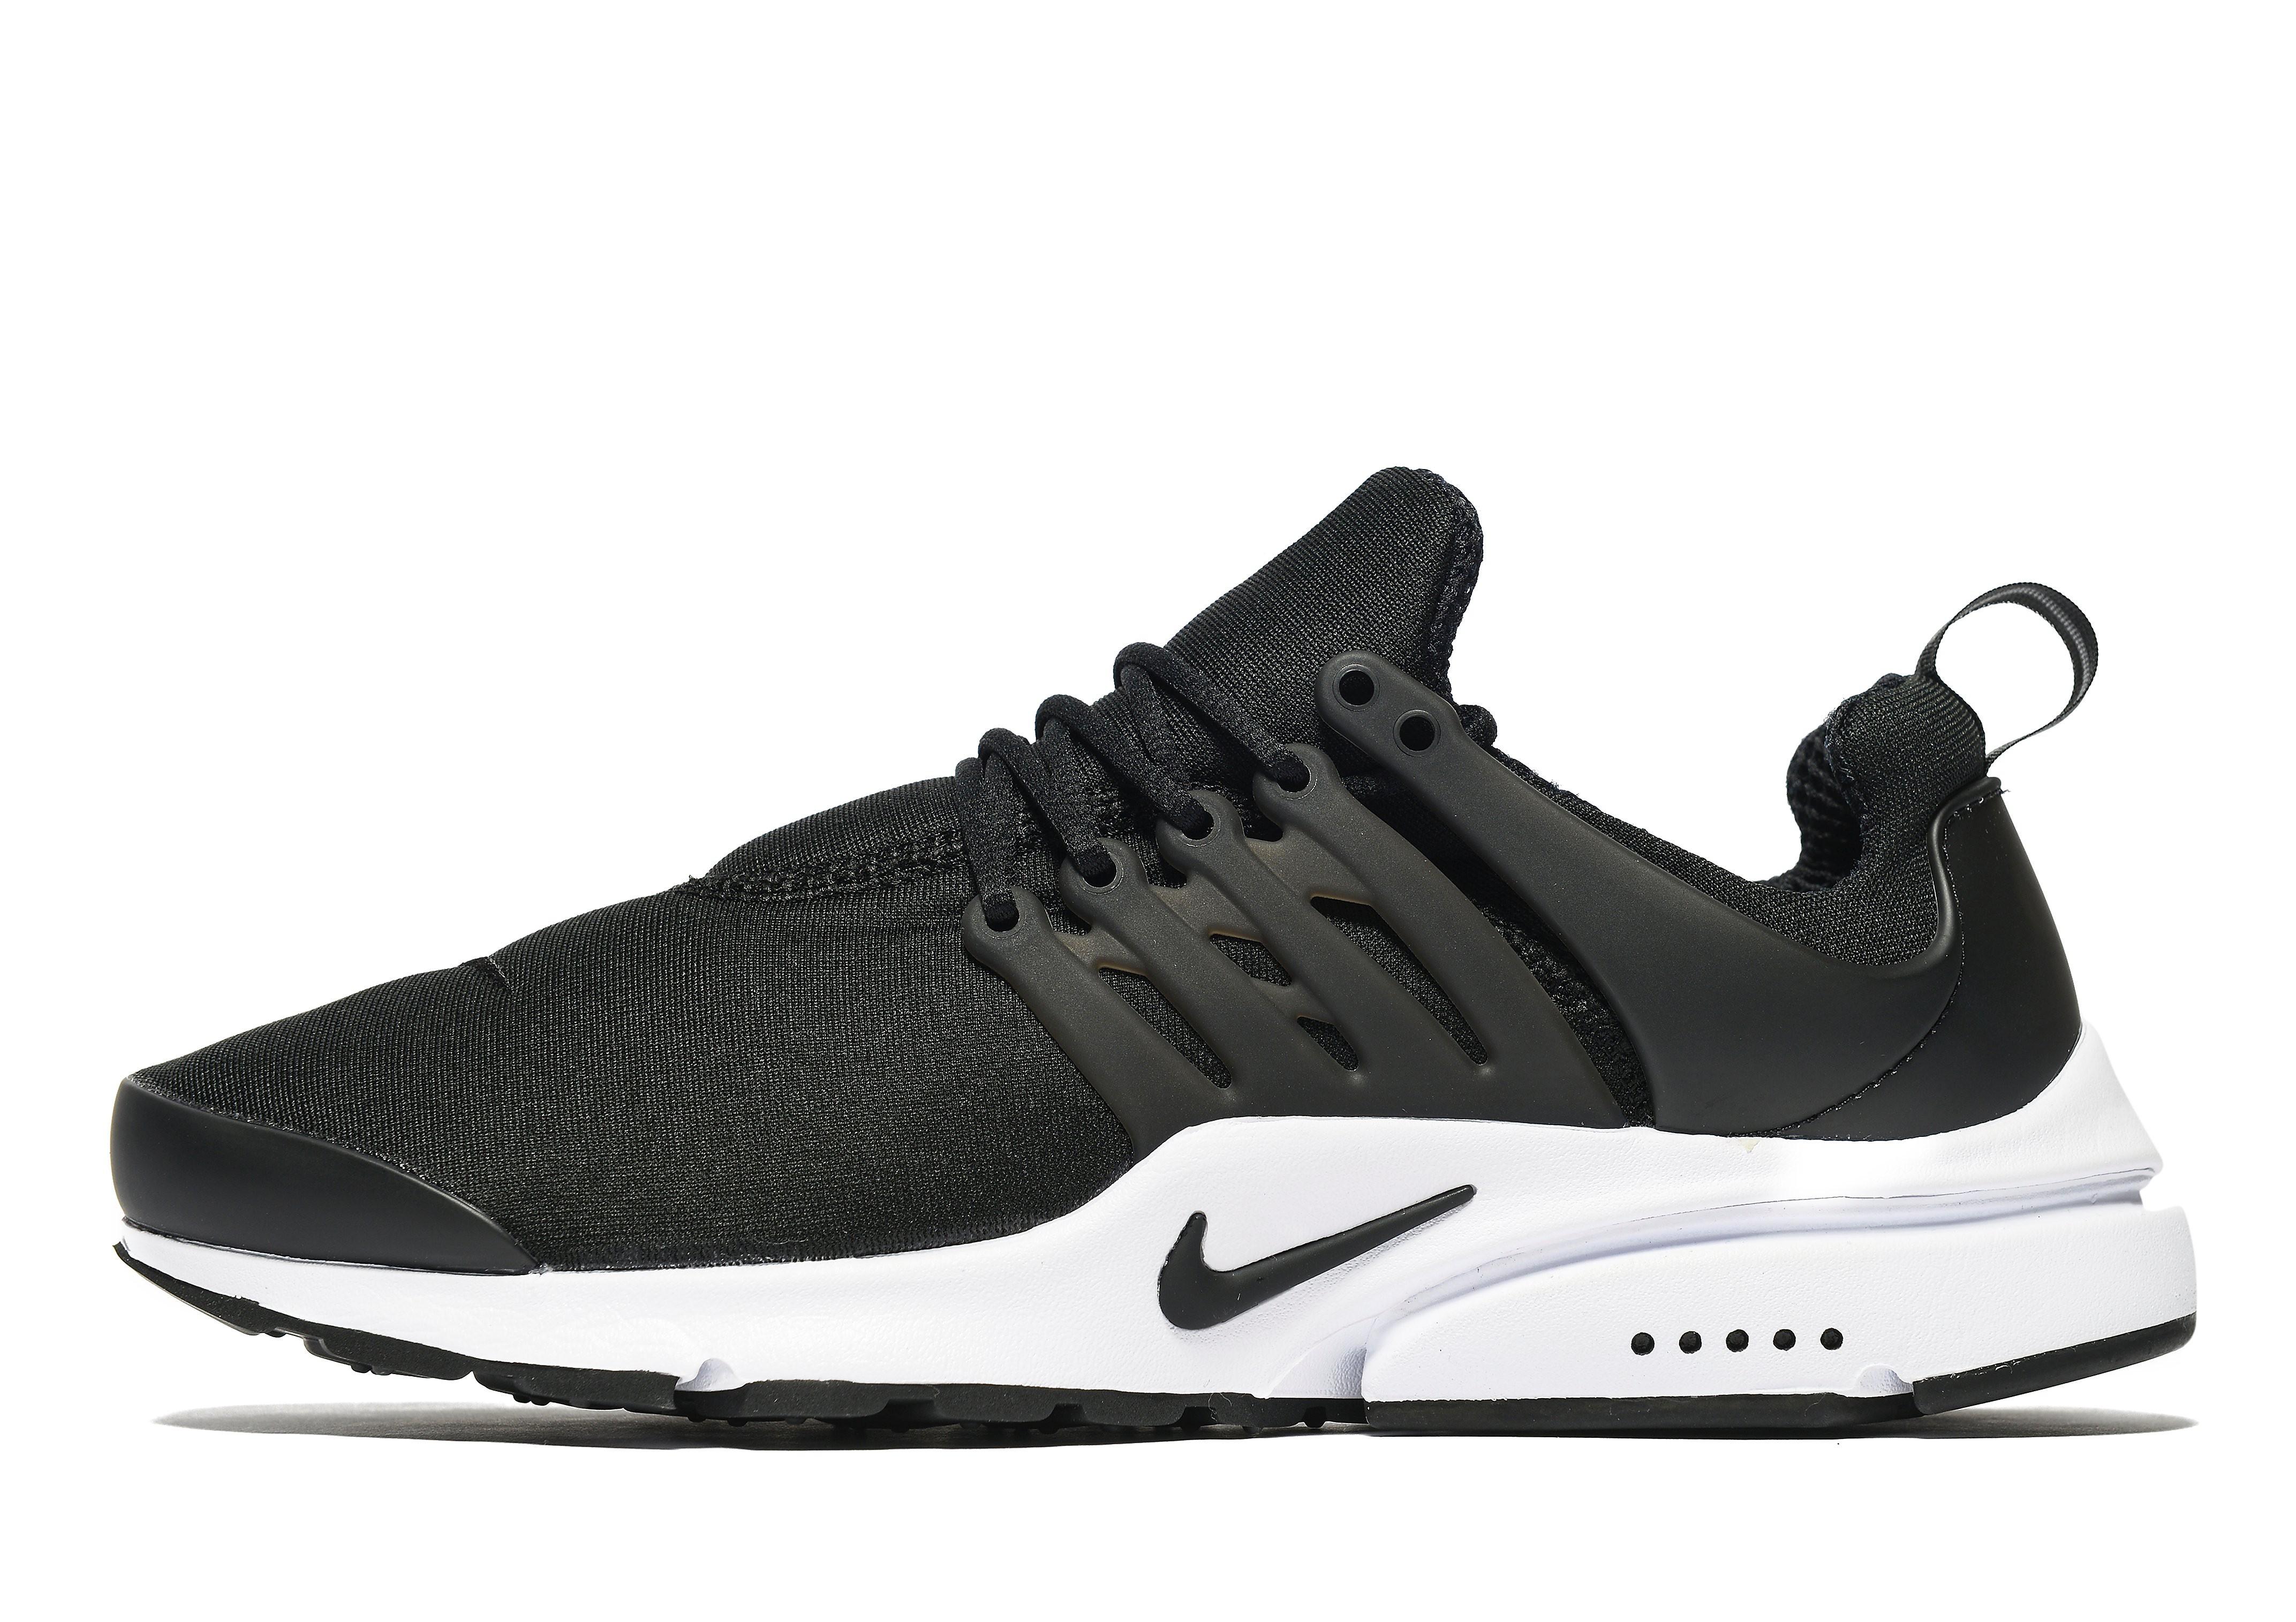 Nike Air Presto Essential